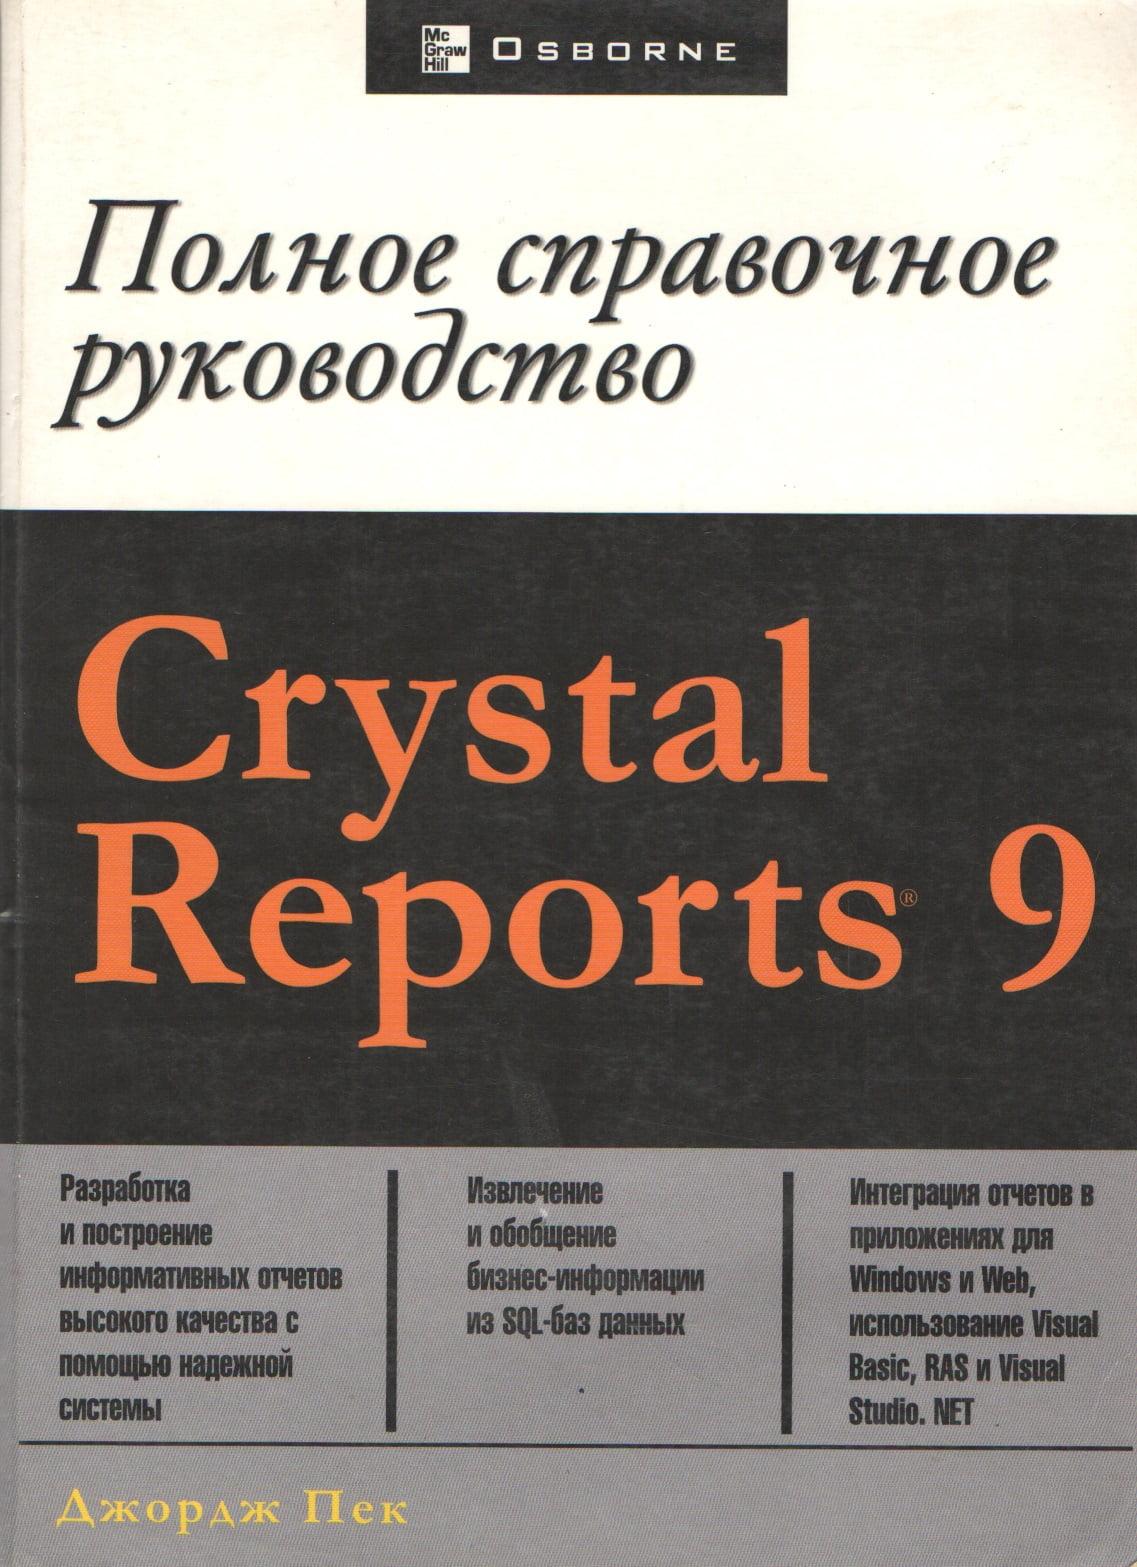 Crystal Reports 9. Полное справочное руководство - фото 1